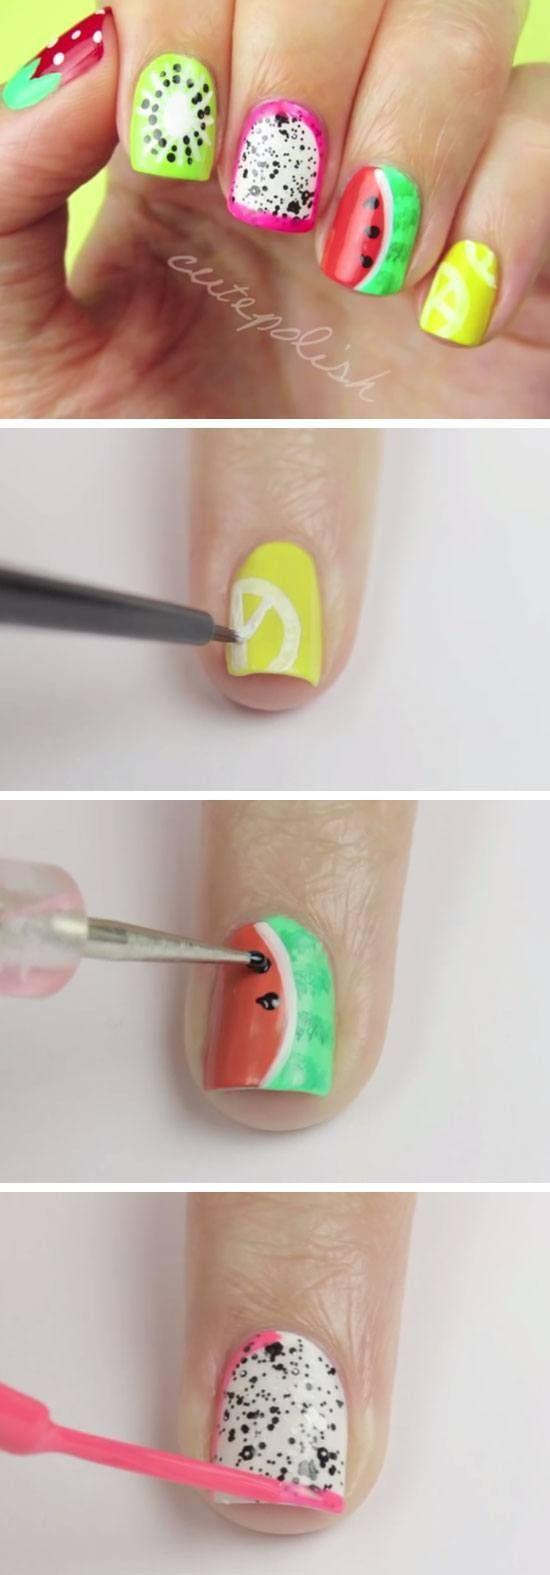 summer fruit nail art designs easy summer nails designs for